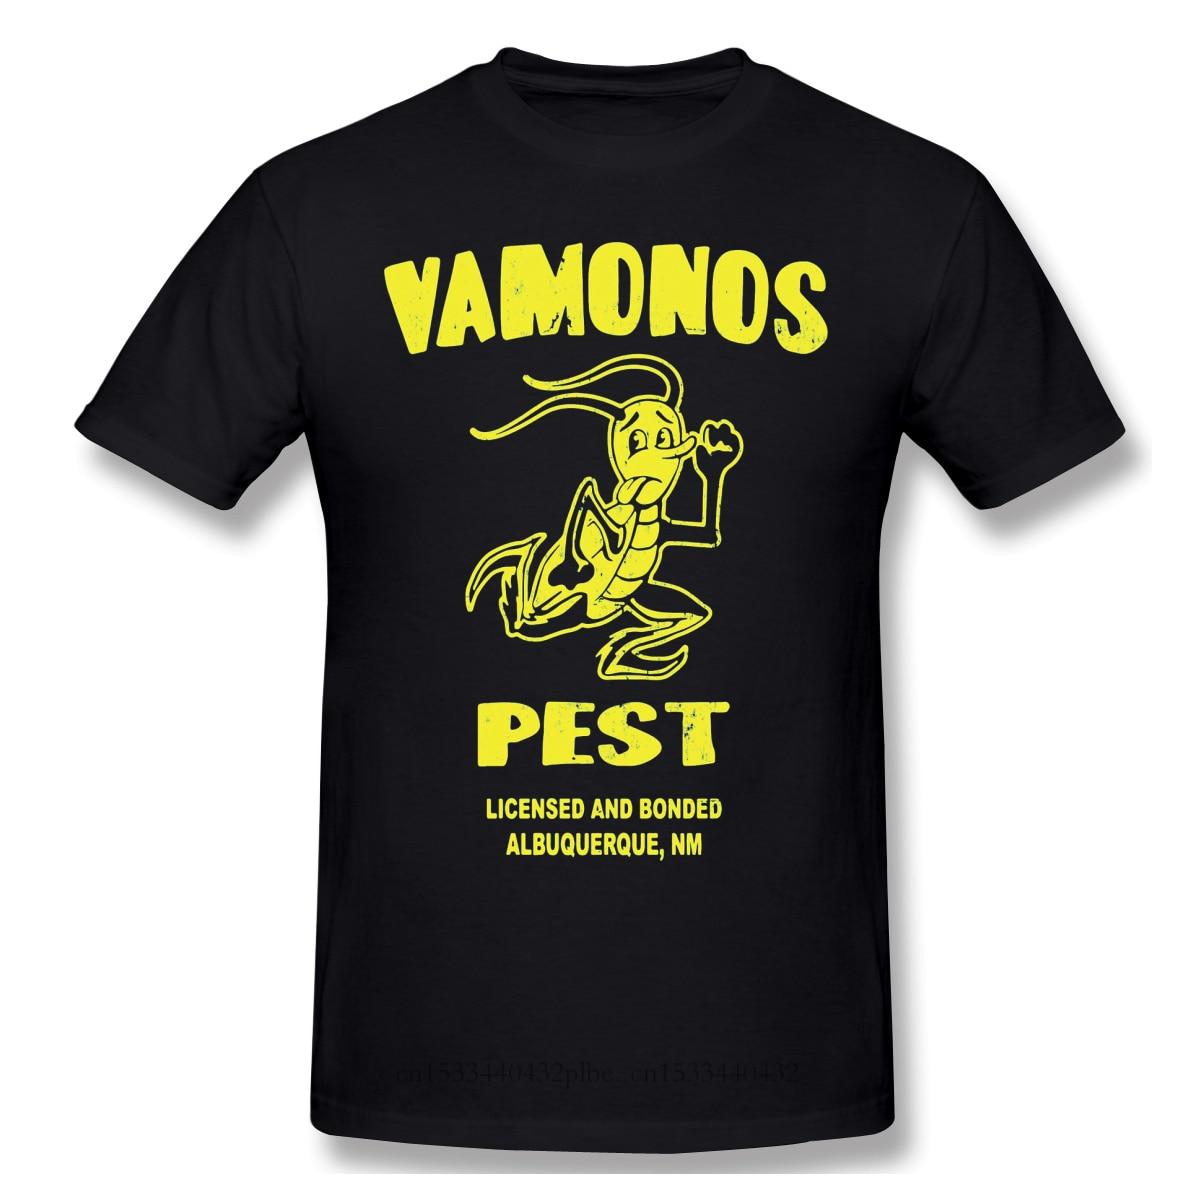 Next S Albuquerque Black T Shirt Better Call Saul James Cromwell Homme T-Shirt Tees Pure Oversized Short Sleeve